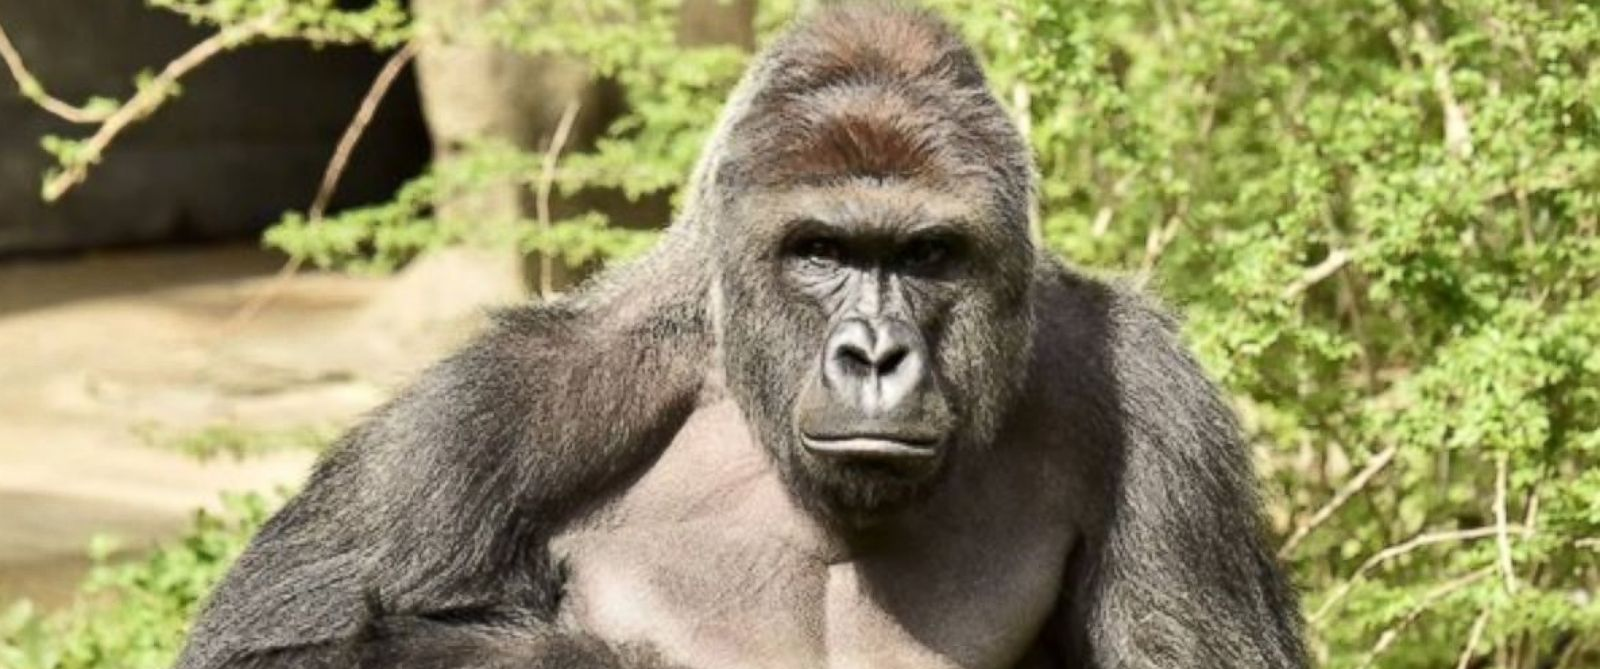 gorilla_1464620362641.jpg